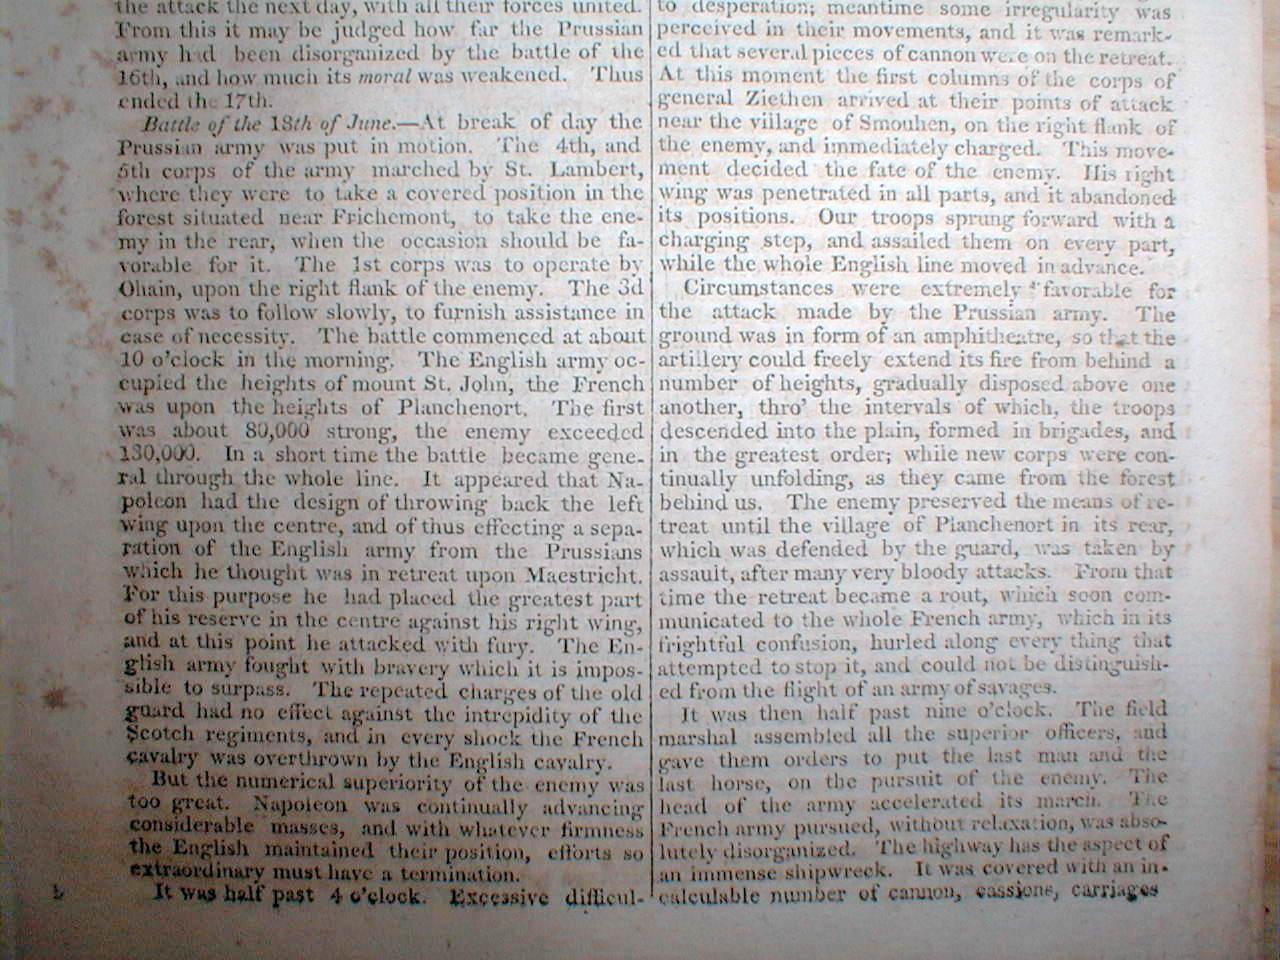 an eyewitness account of the napoleonic